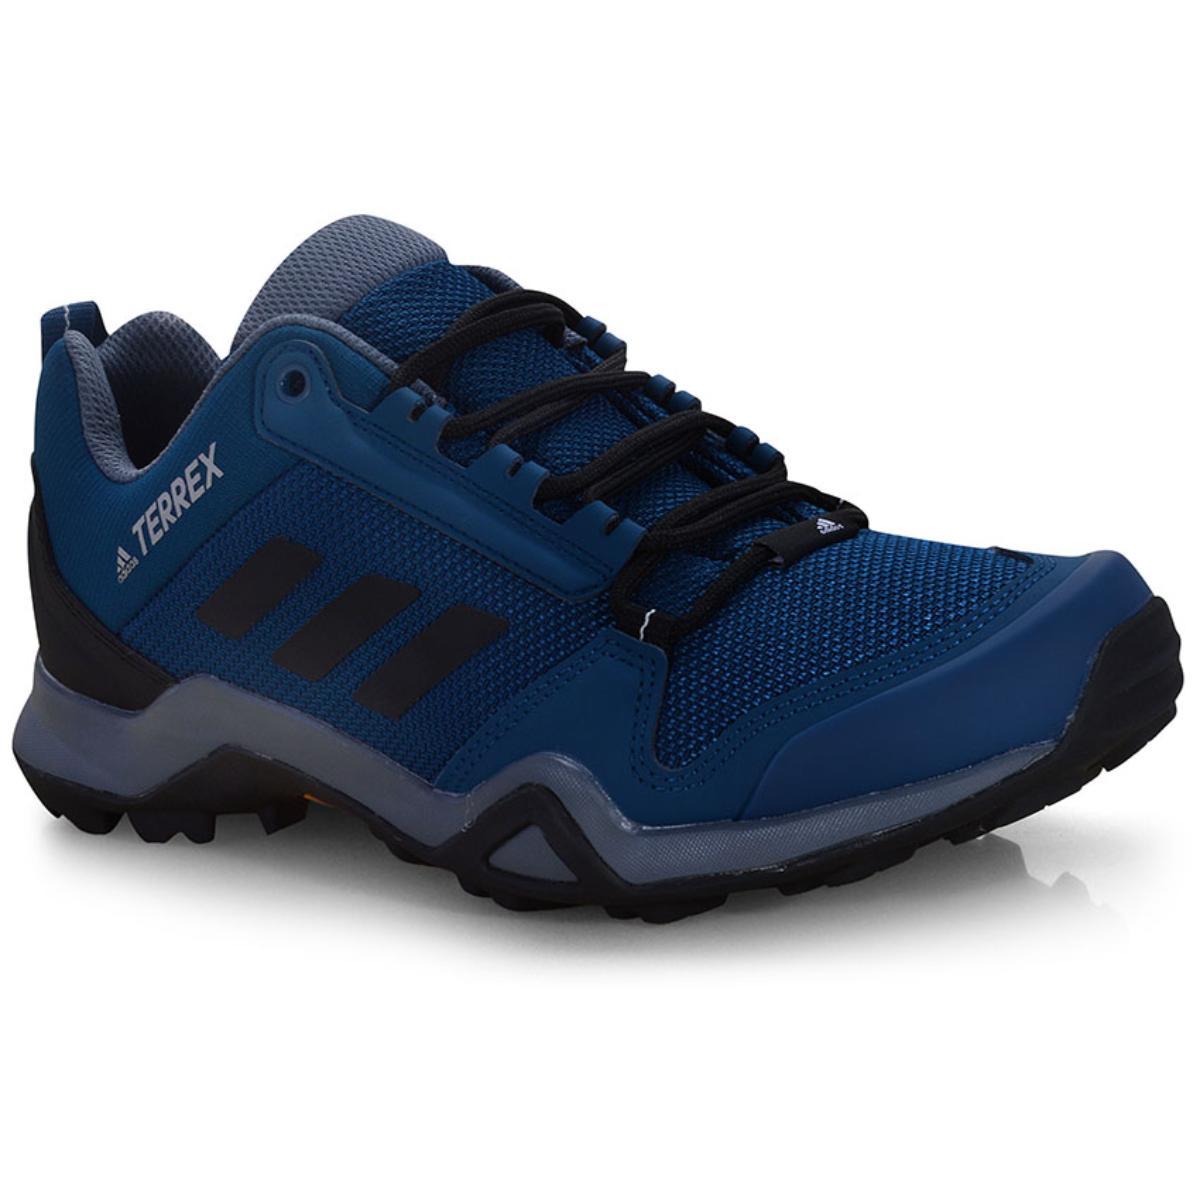 Tênis Masculino Adidas Bc0527 Terrex Ax3 Marinho/preto